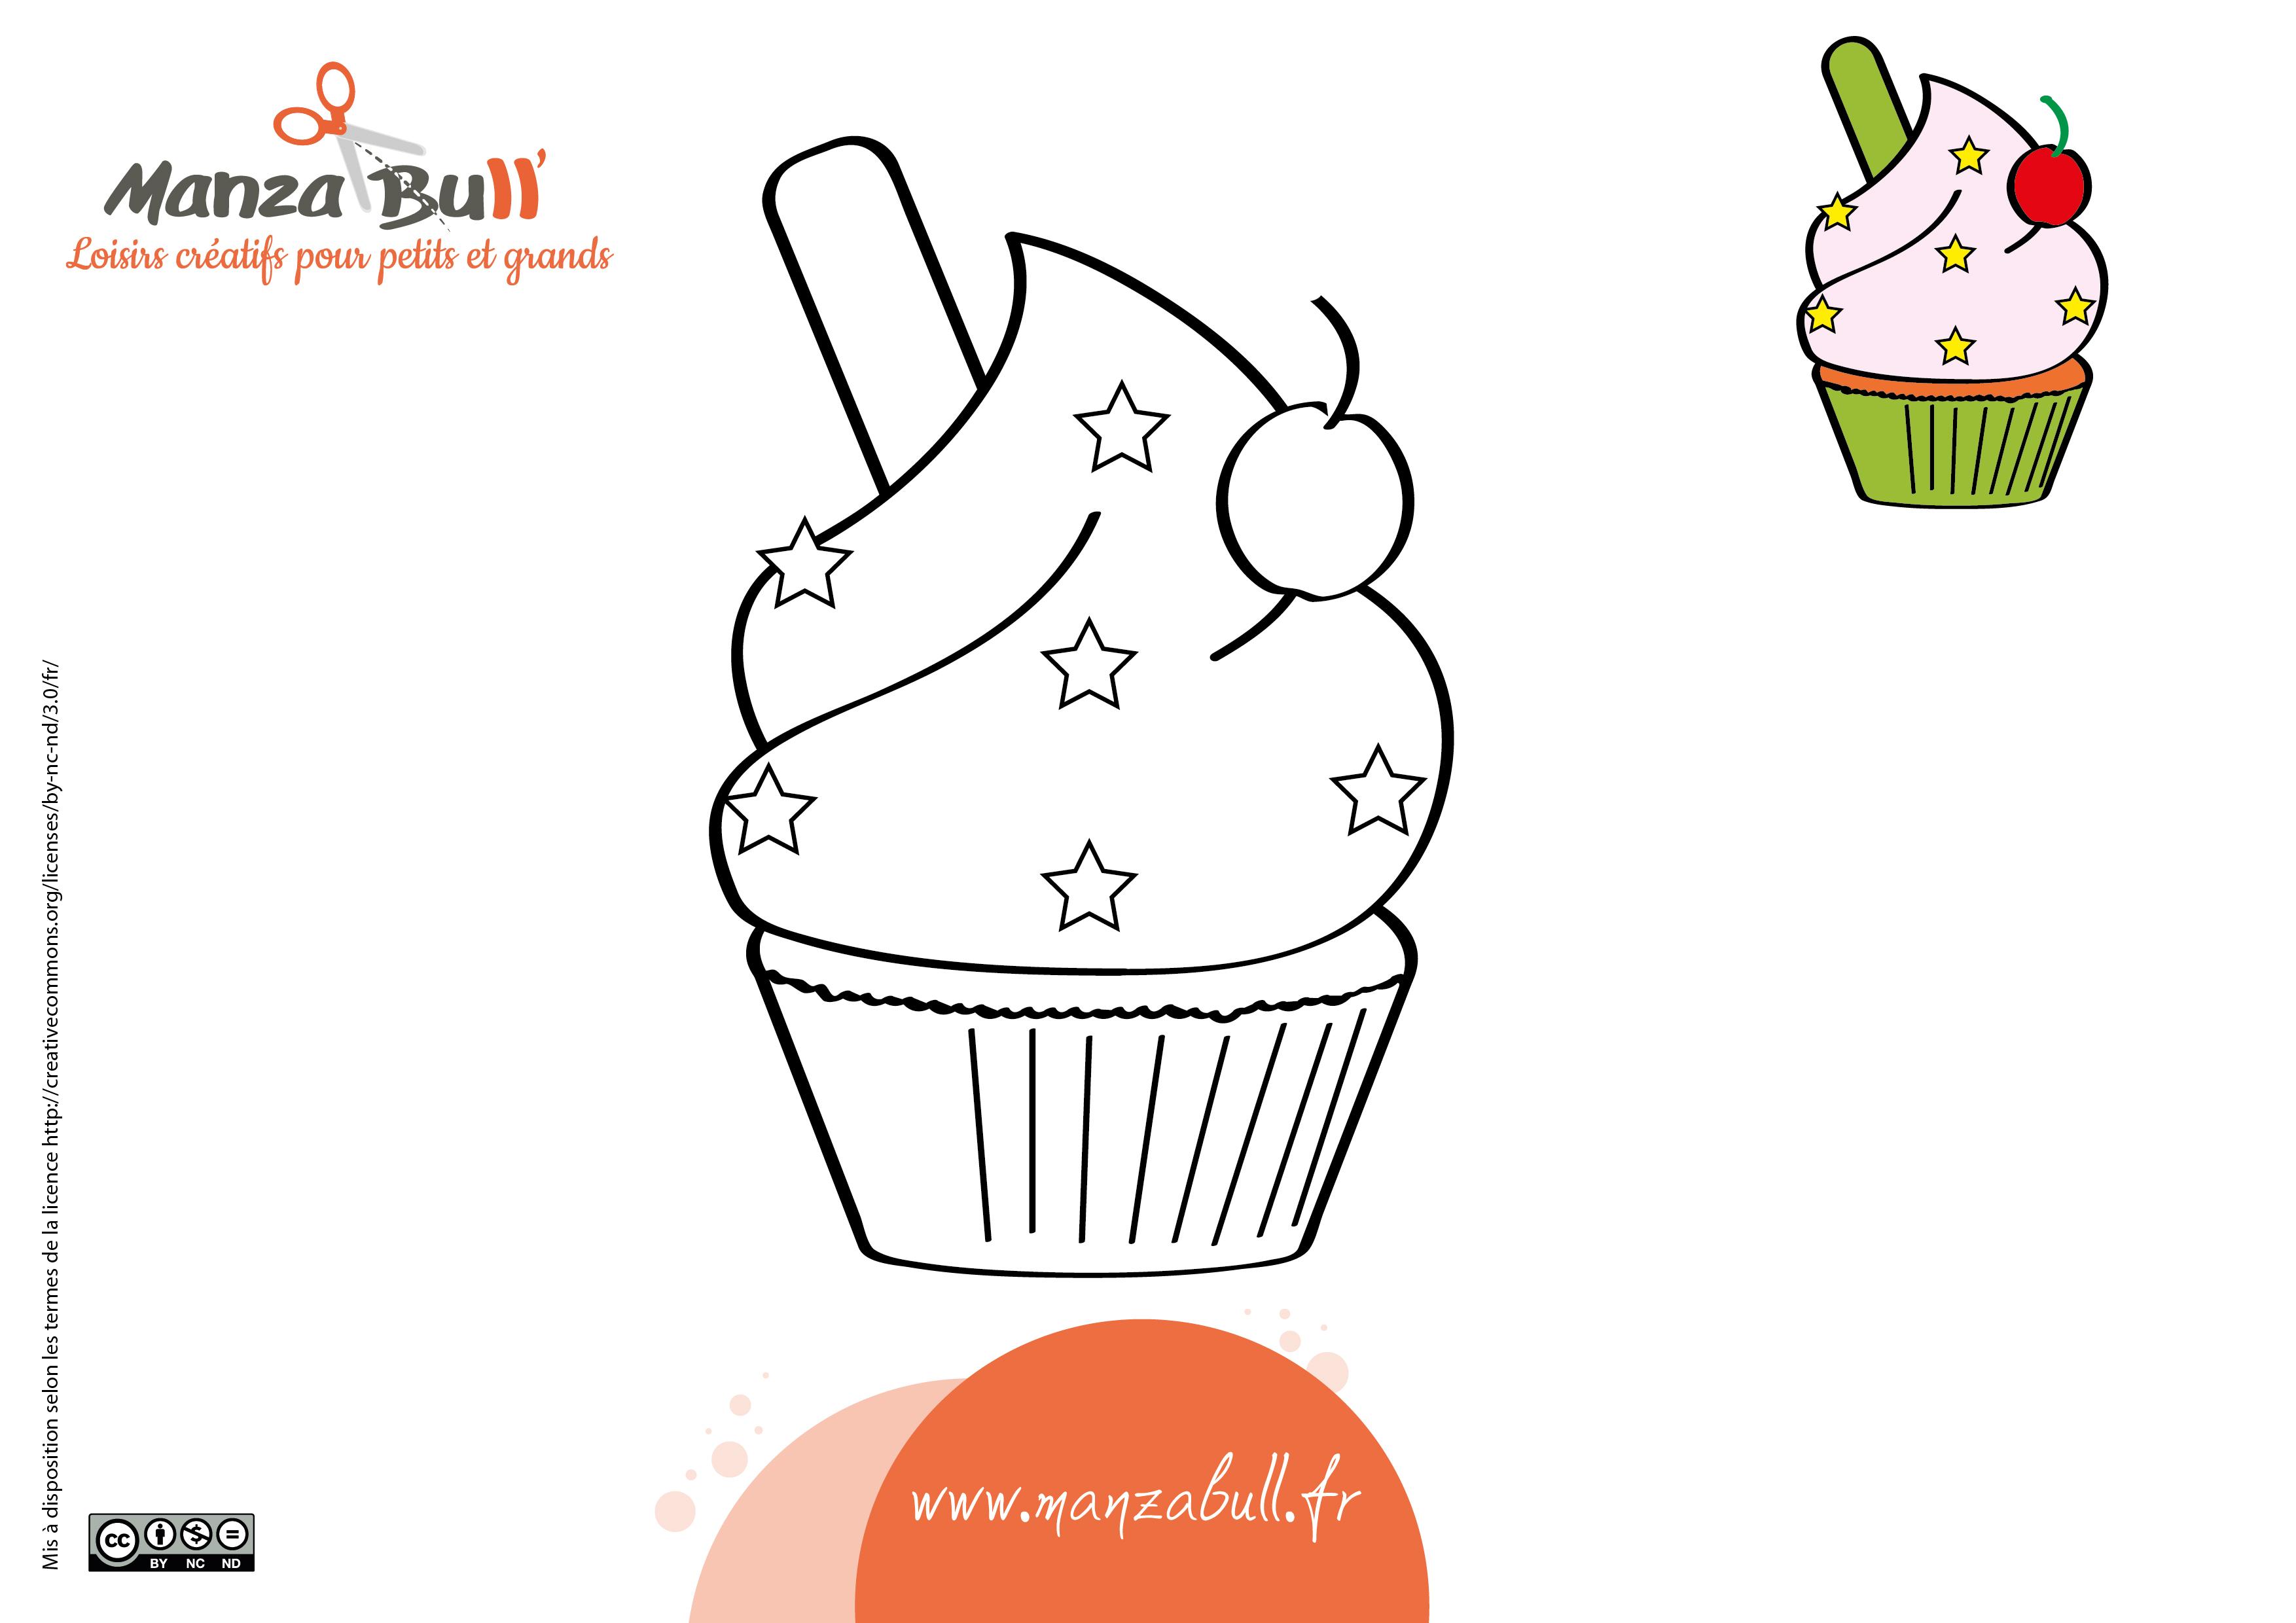 manzabull_cupcakes-03